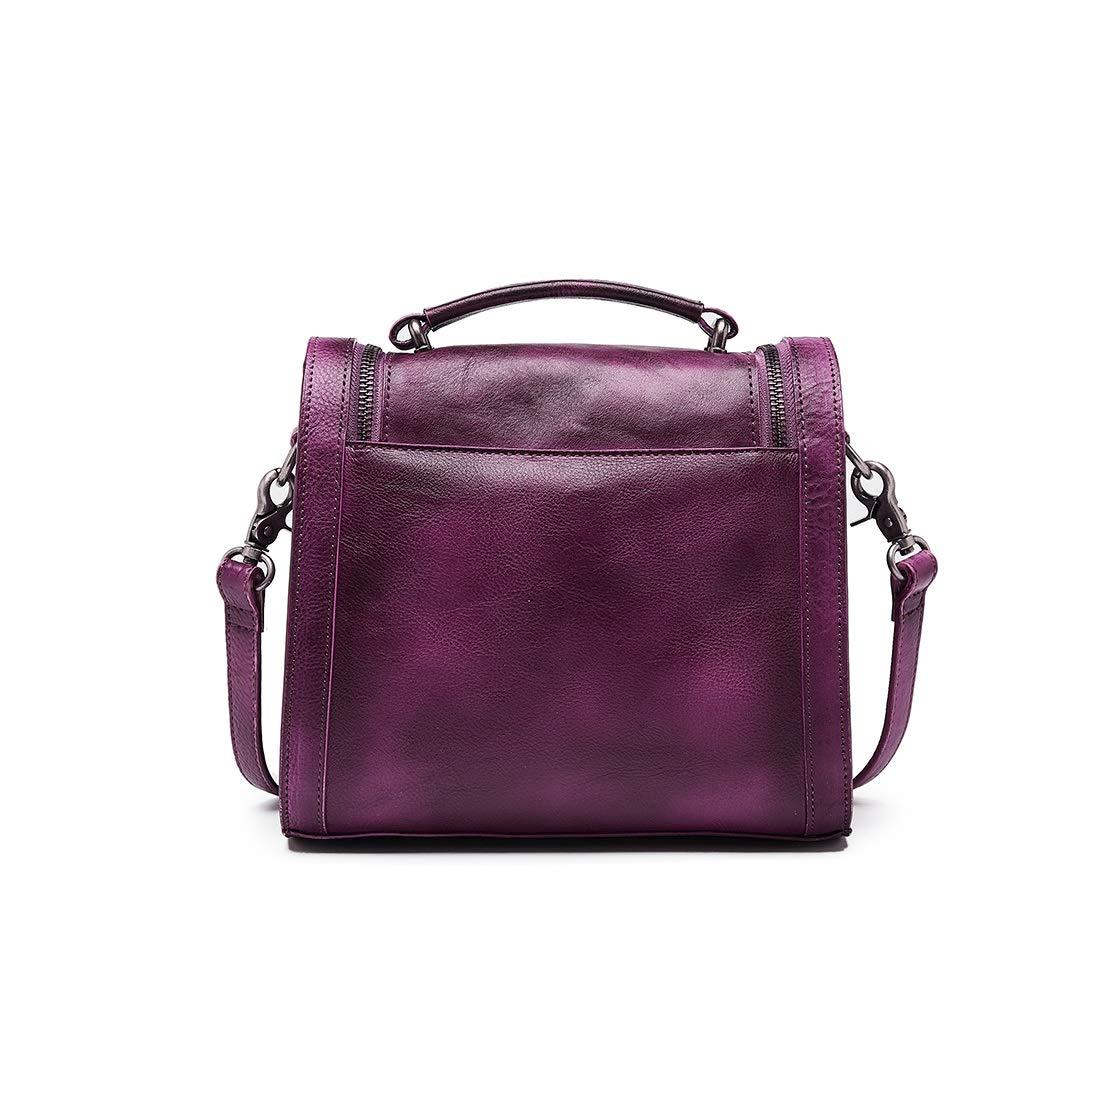 AIYAMAYA Crossbody Bag for Women Vintage Genuine Leather Top Handle Tote Purses Satchels Handbag